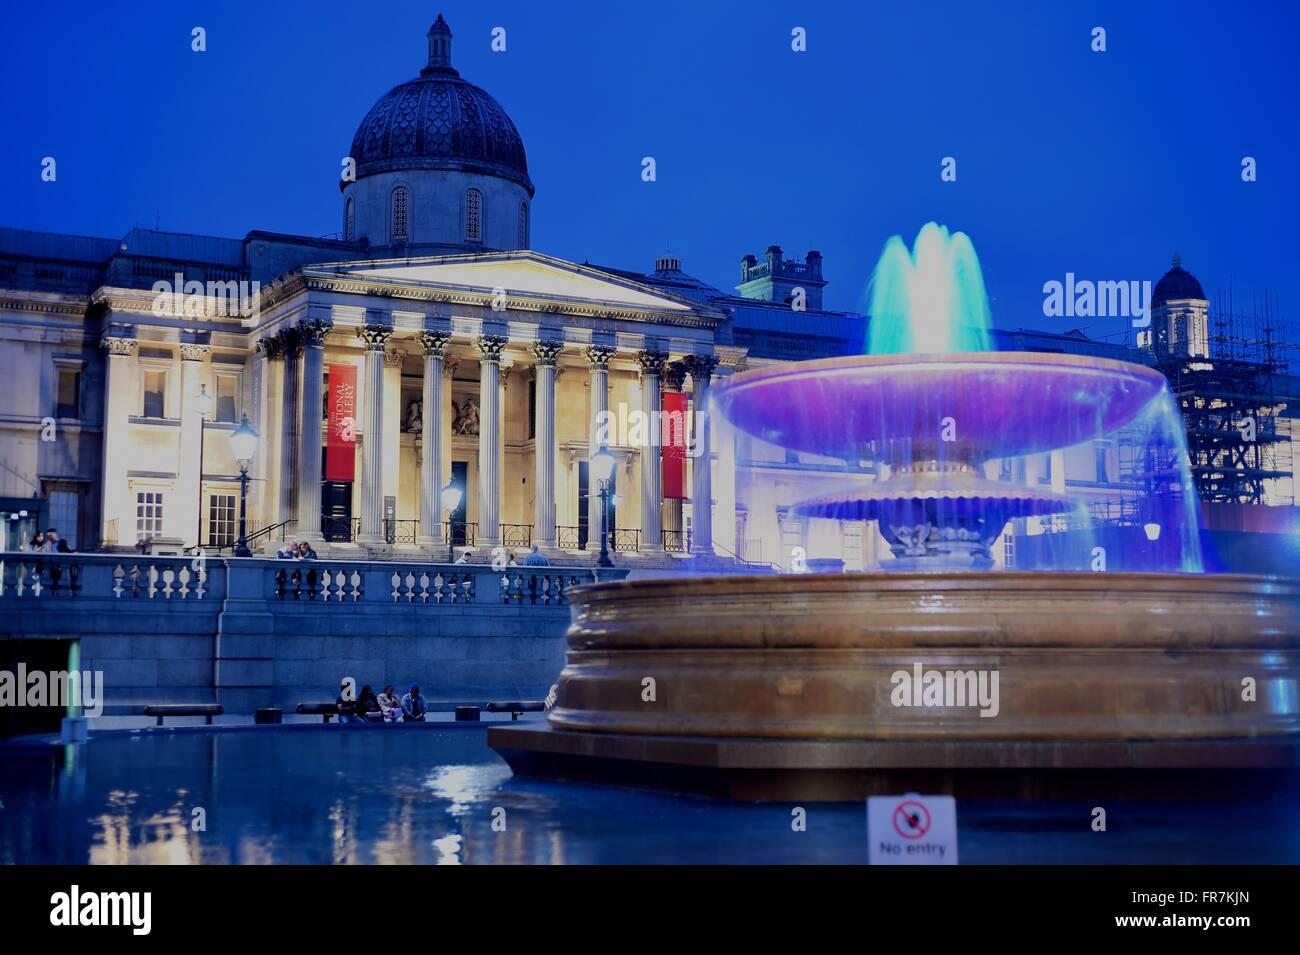 National Gallery, Trafalgar Square, Londres, Musée, expositions. L'eau des fontaines, Photo Stock